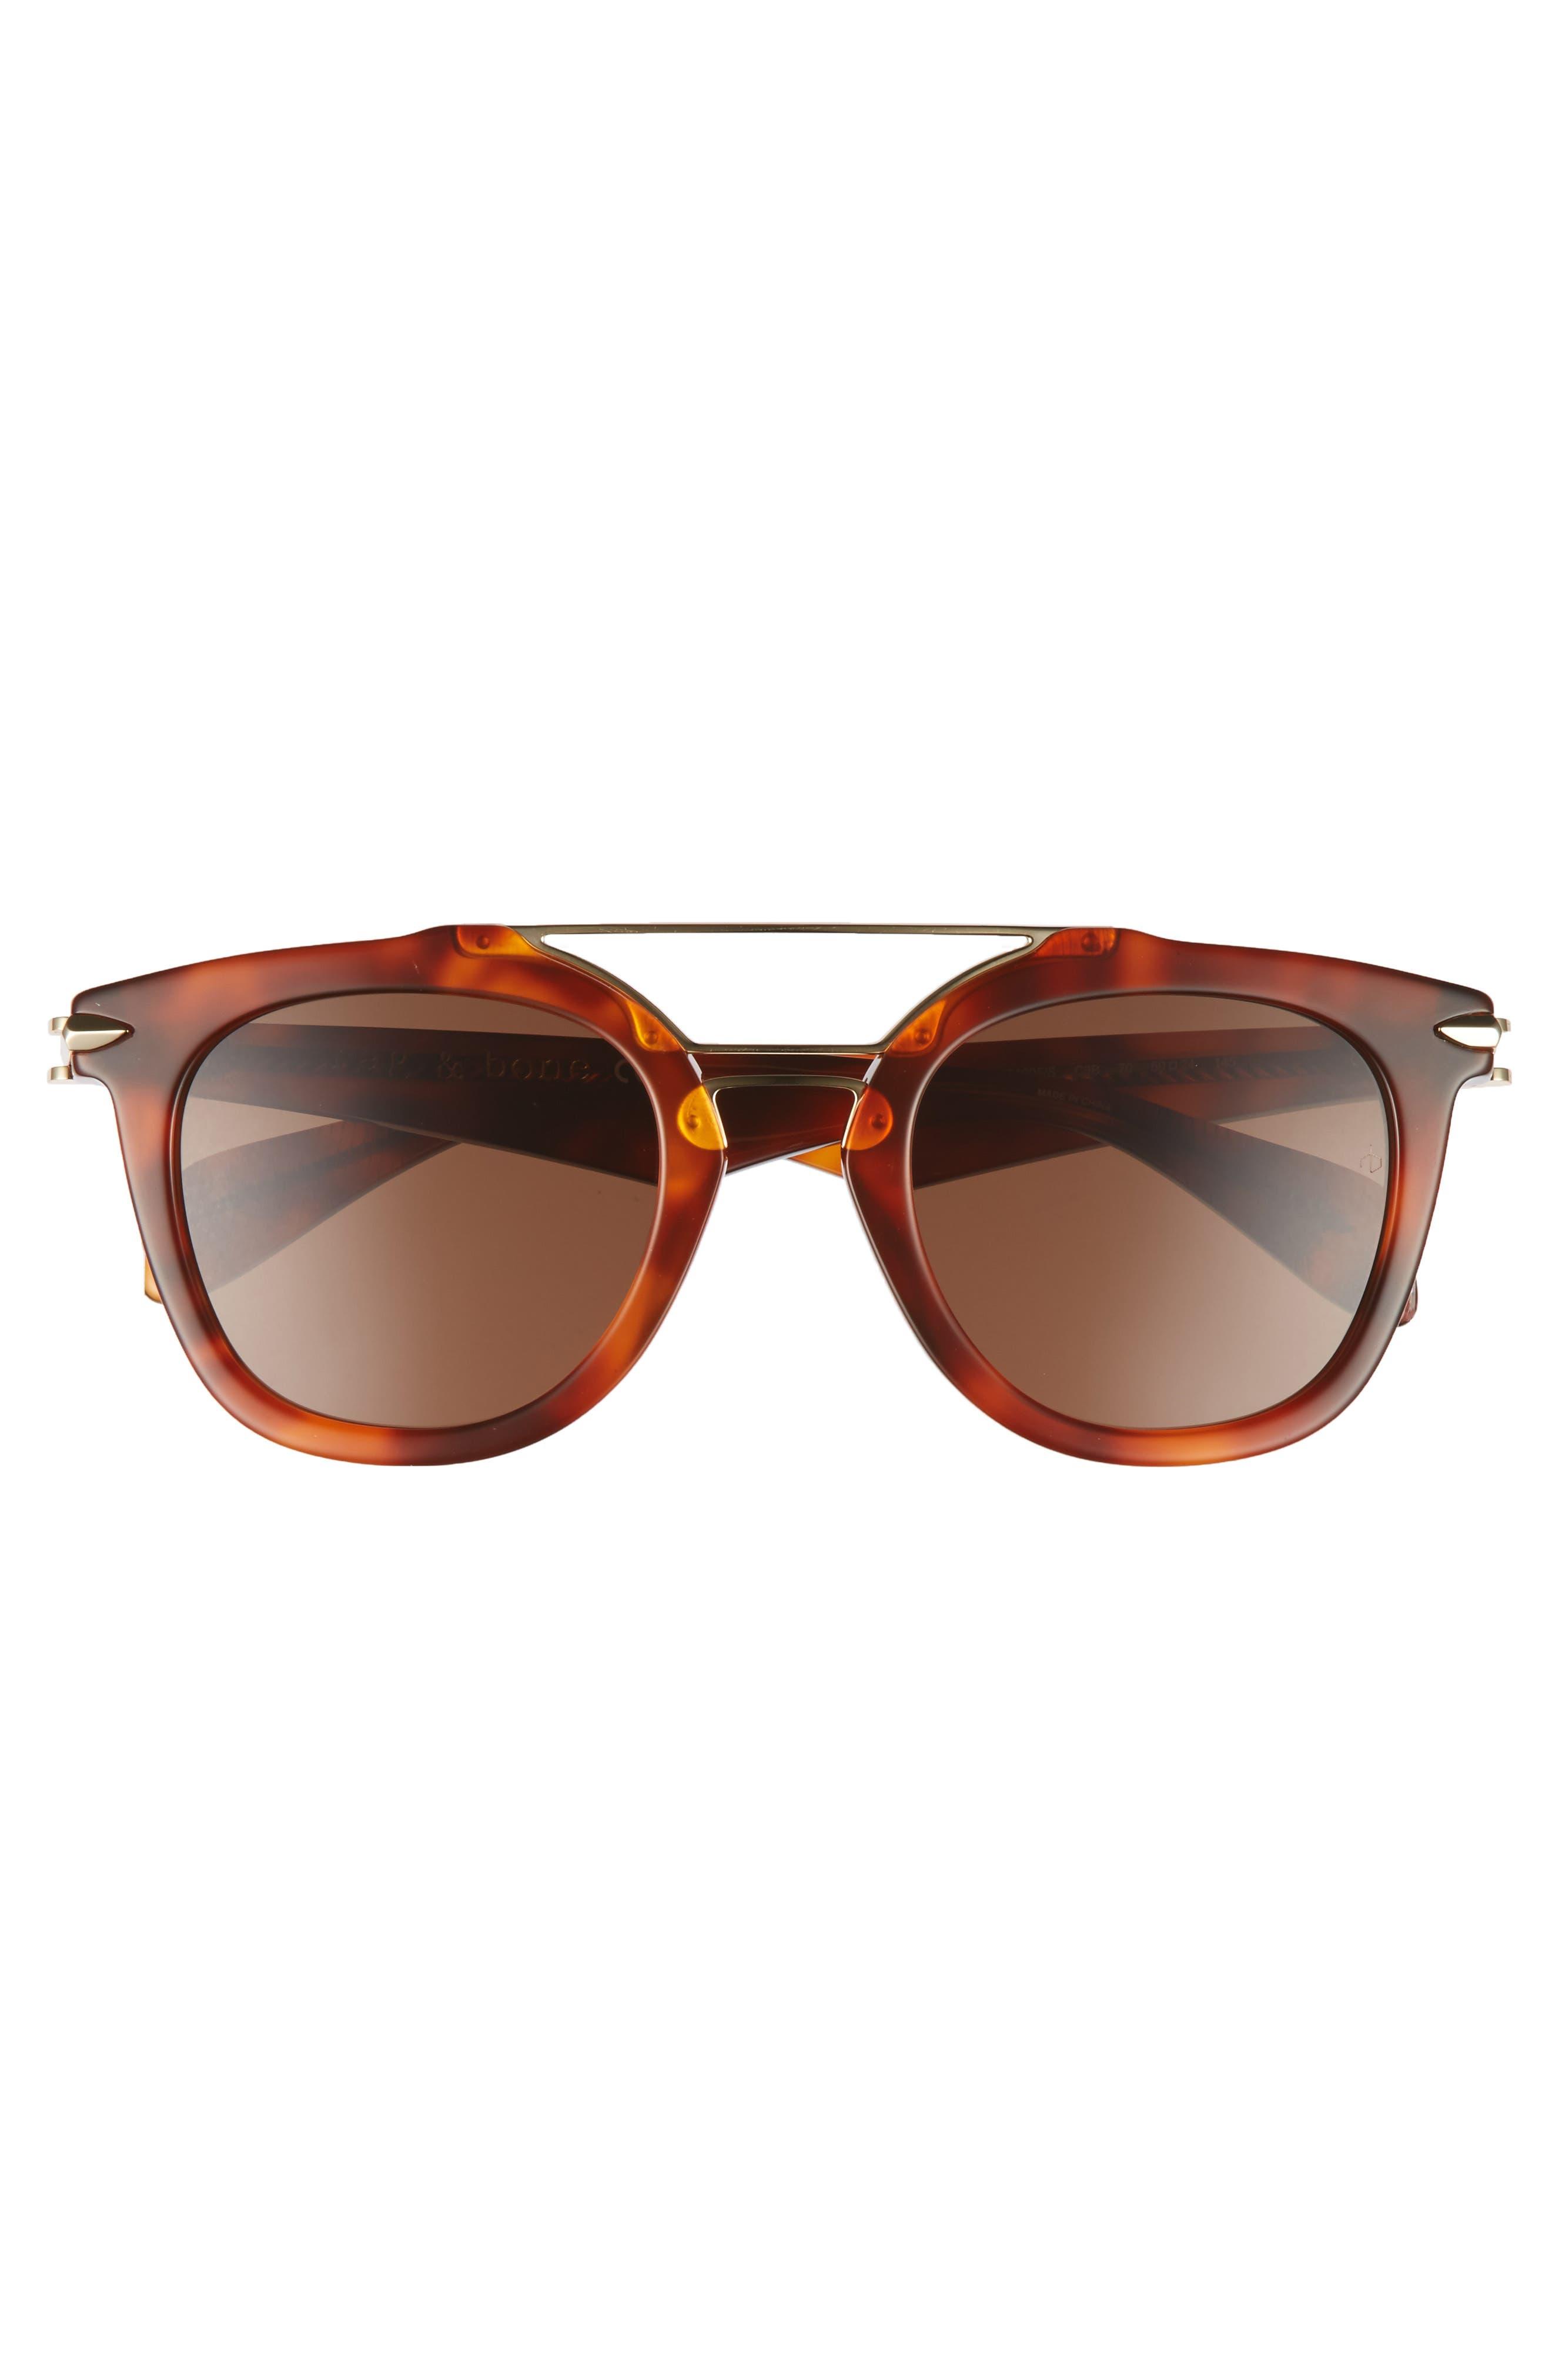 50mm Round Aviator Sunglasses,                             Alternate thumbnail 3, color,                             Havana Honey